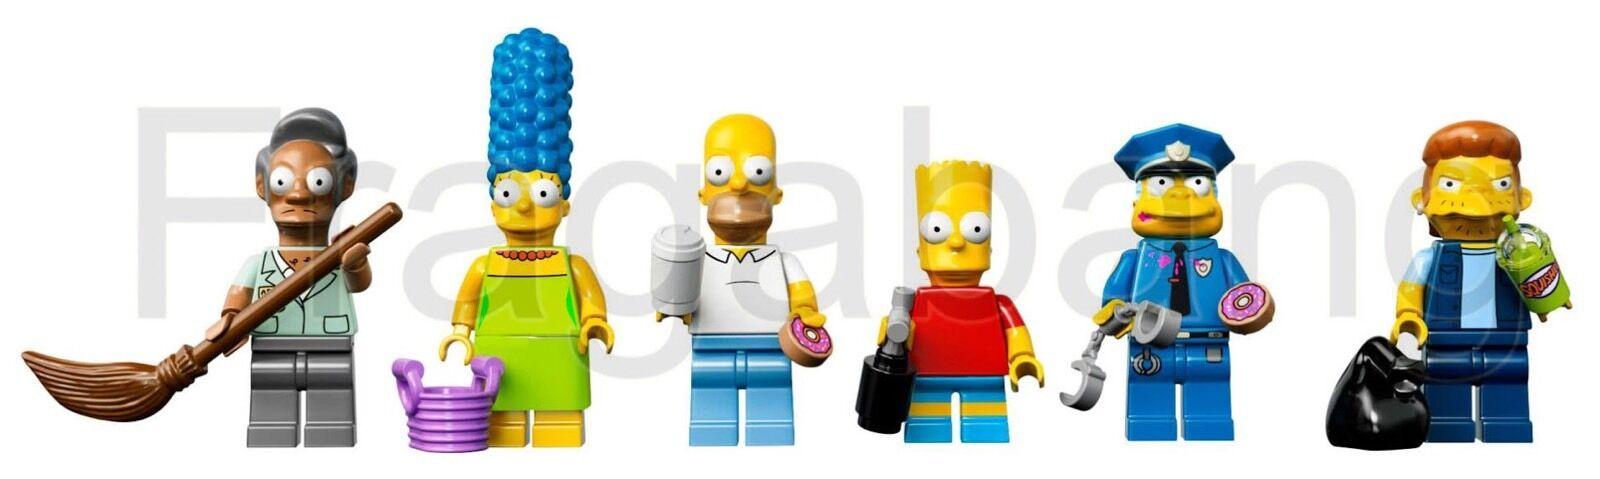 LEGO 71016 I SIMPSON SERIE di Minifigures SPLIT (dal 71016)